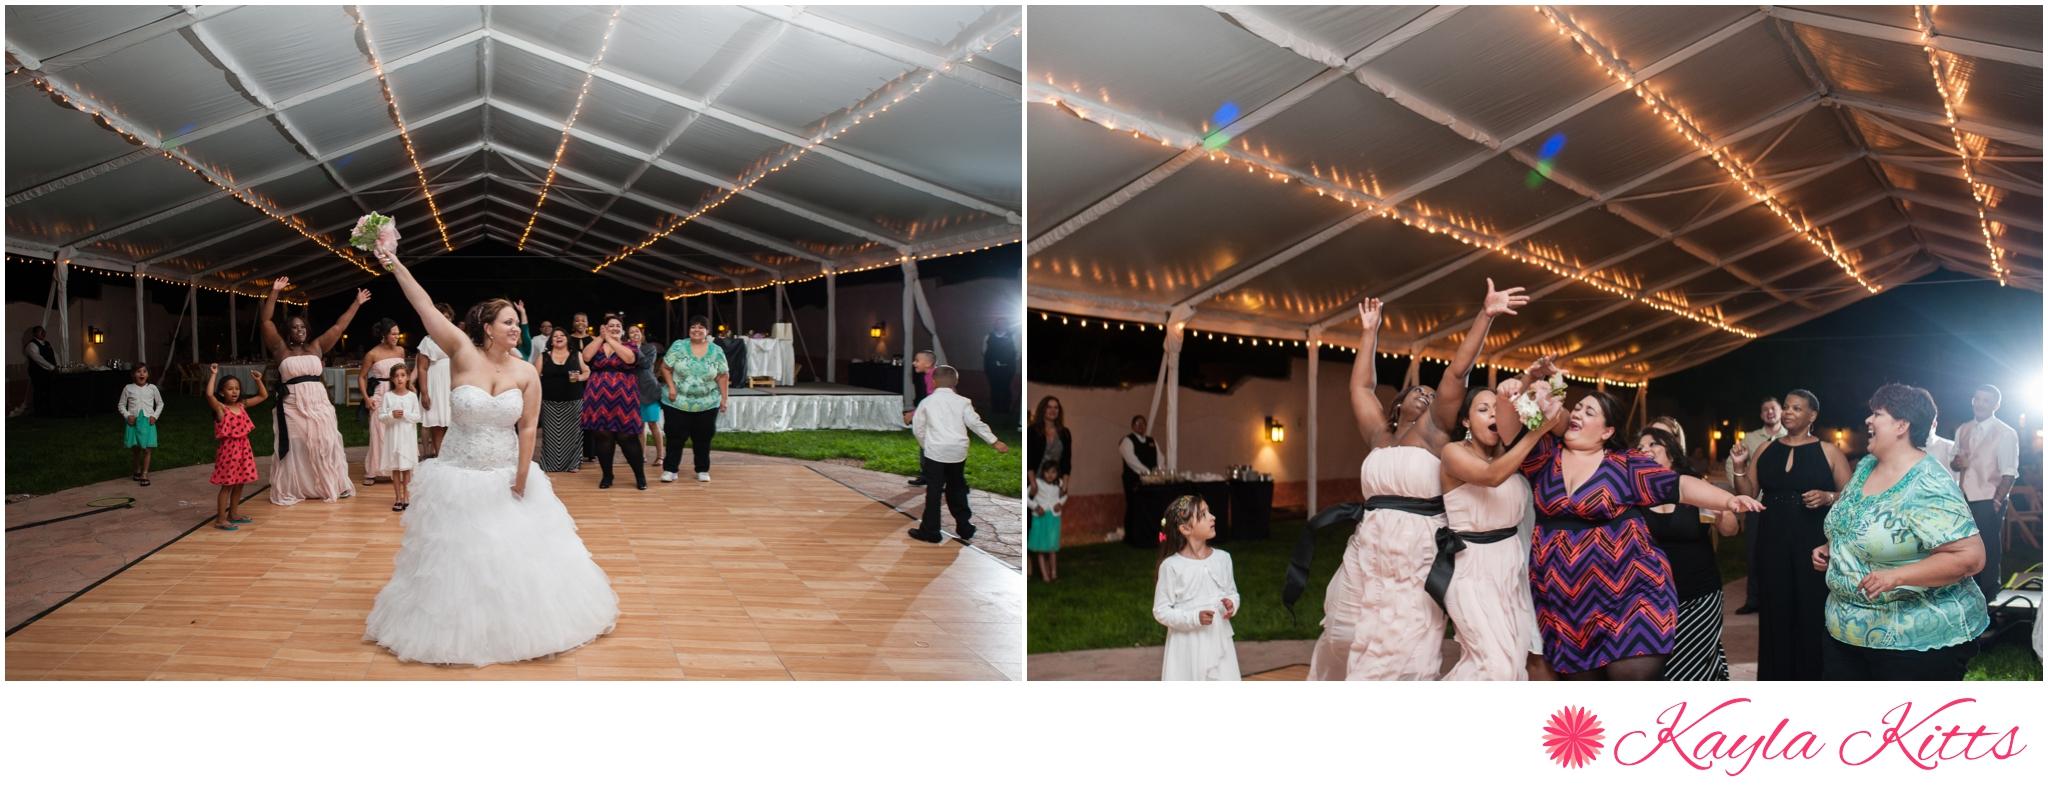 albuquerque-wedding-hyatt tamaya-new mexico-engagement-photography-albuquerque wedding photographer